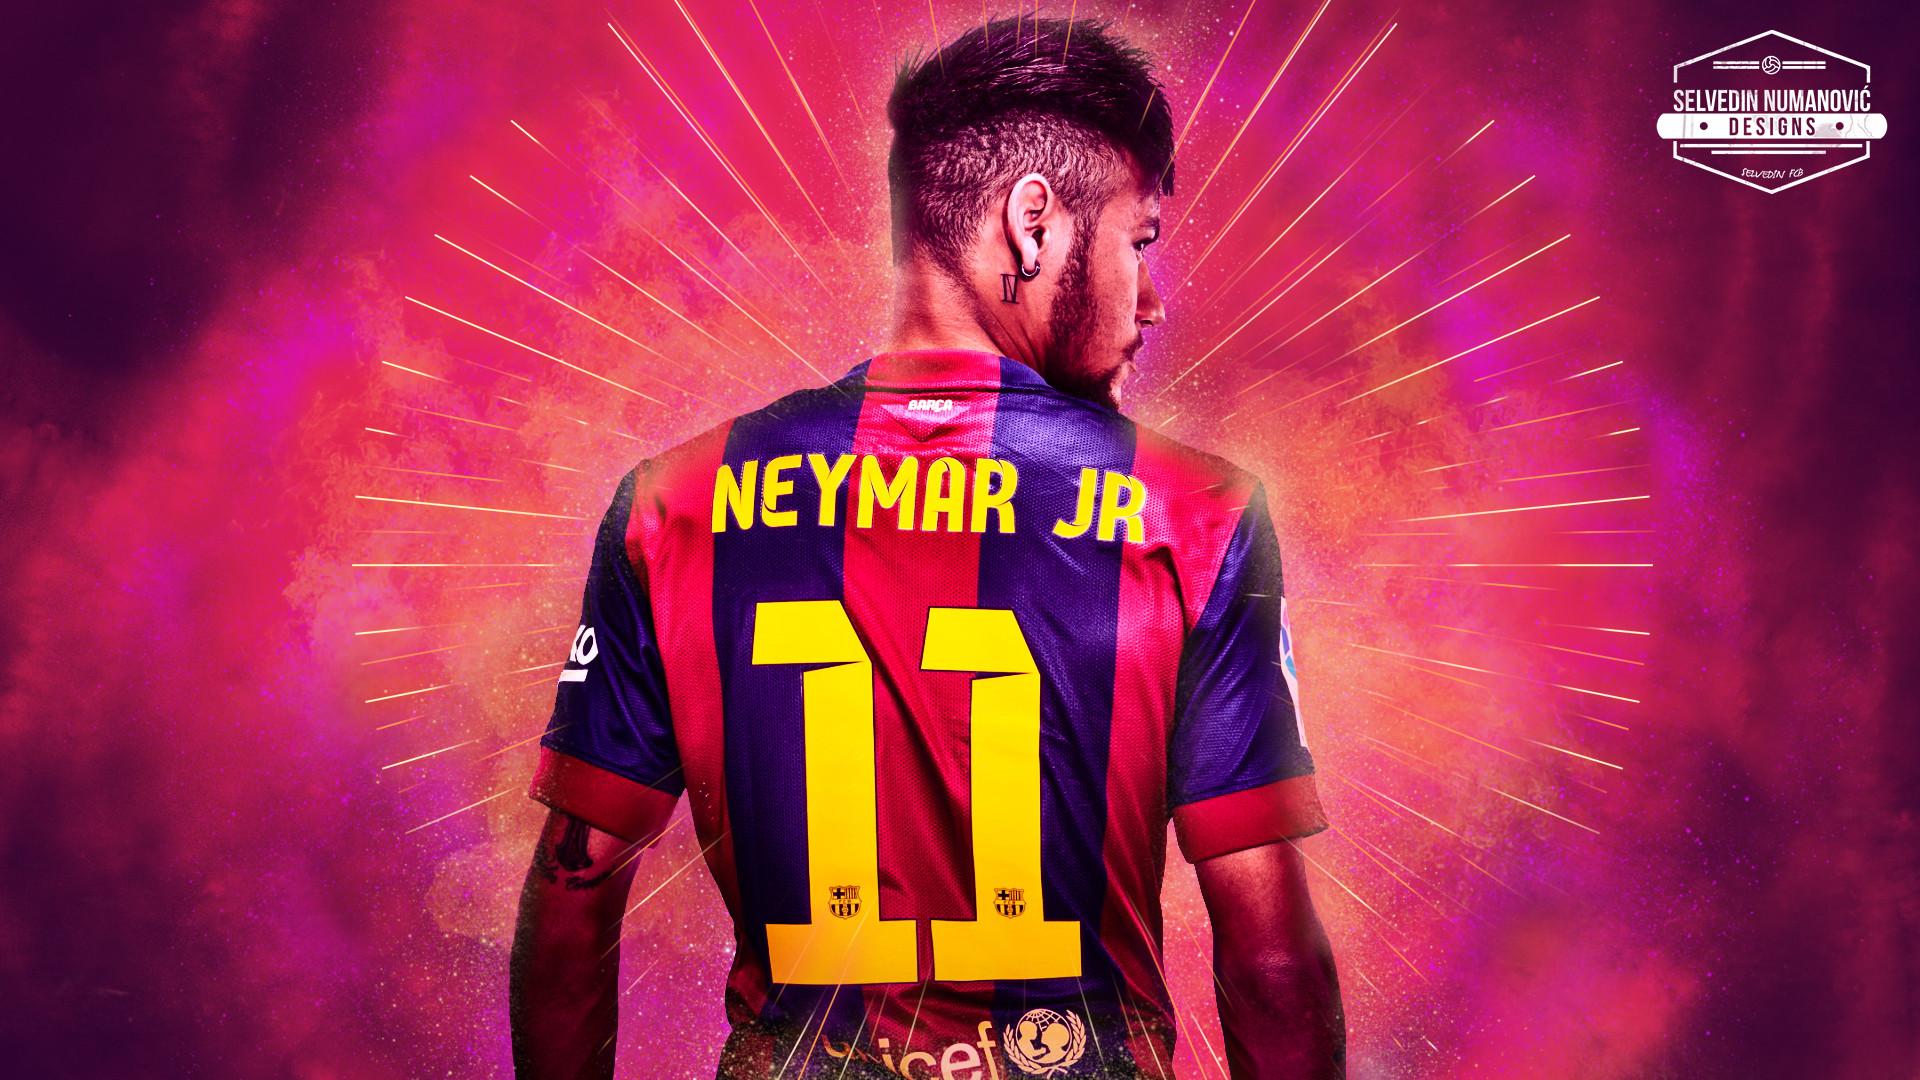 … Neymar Jr. HD wallpaper 2015 by SelvedinFCB